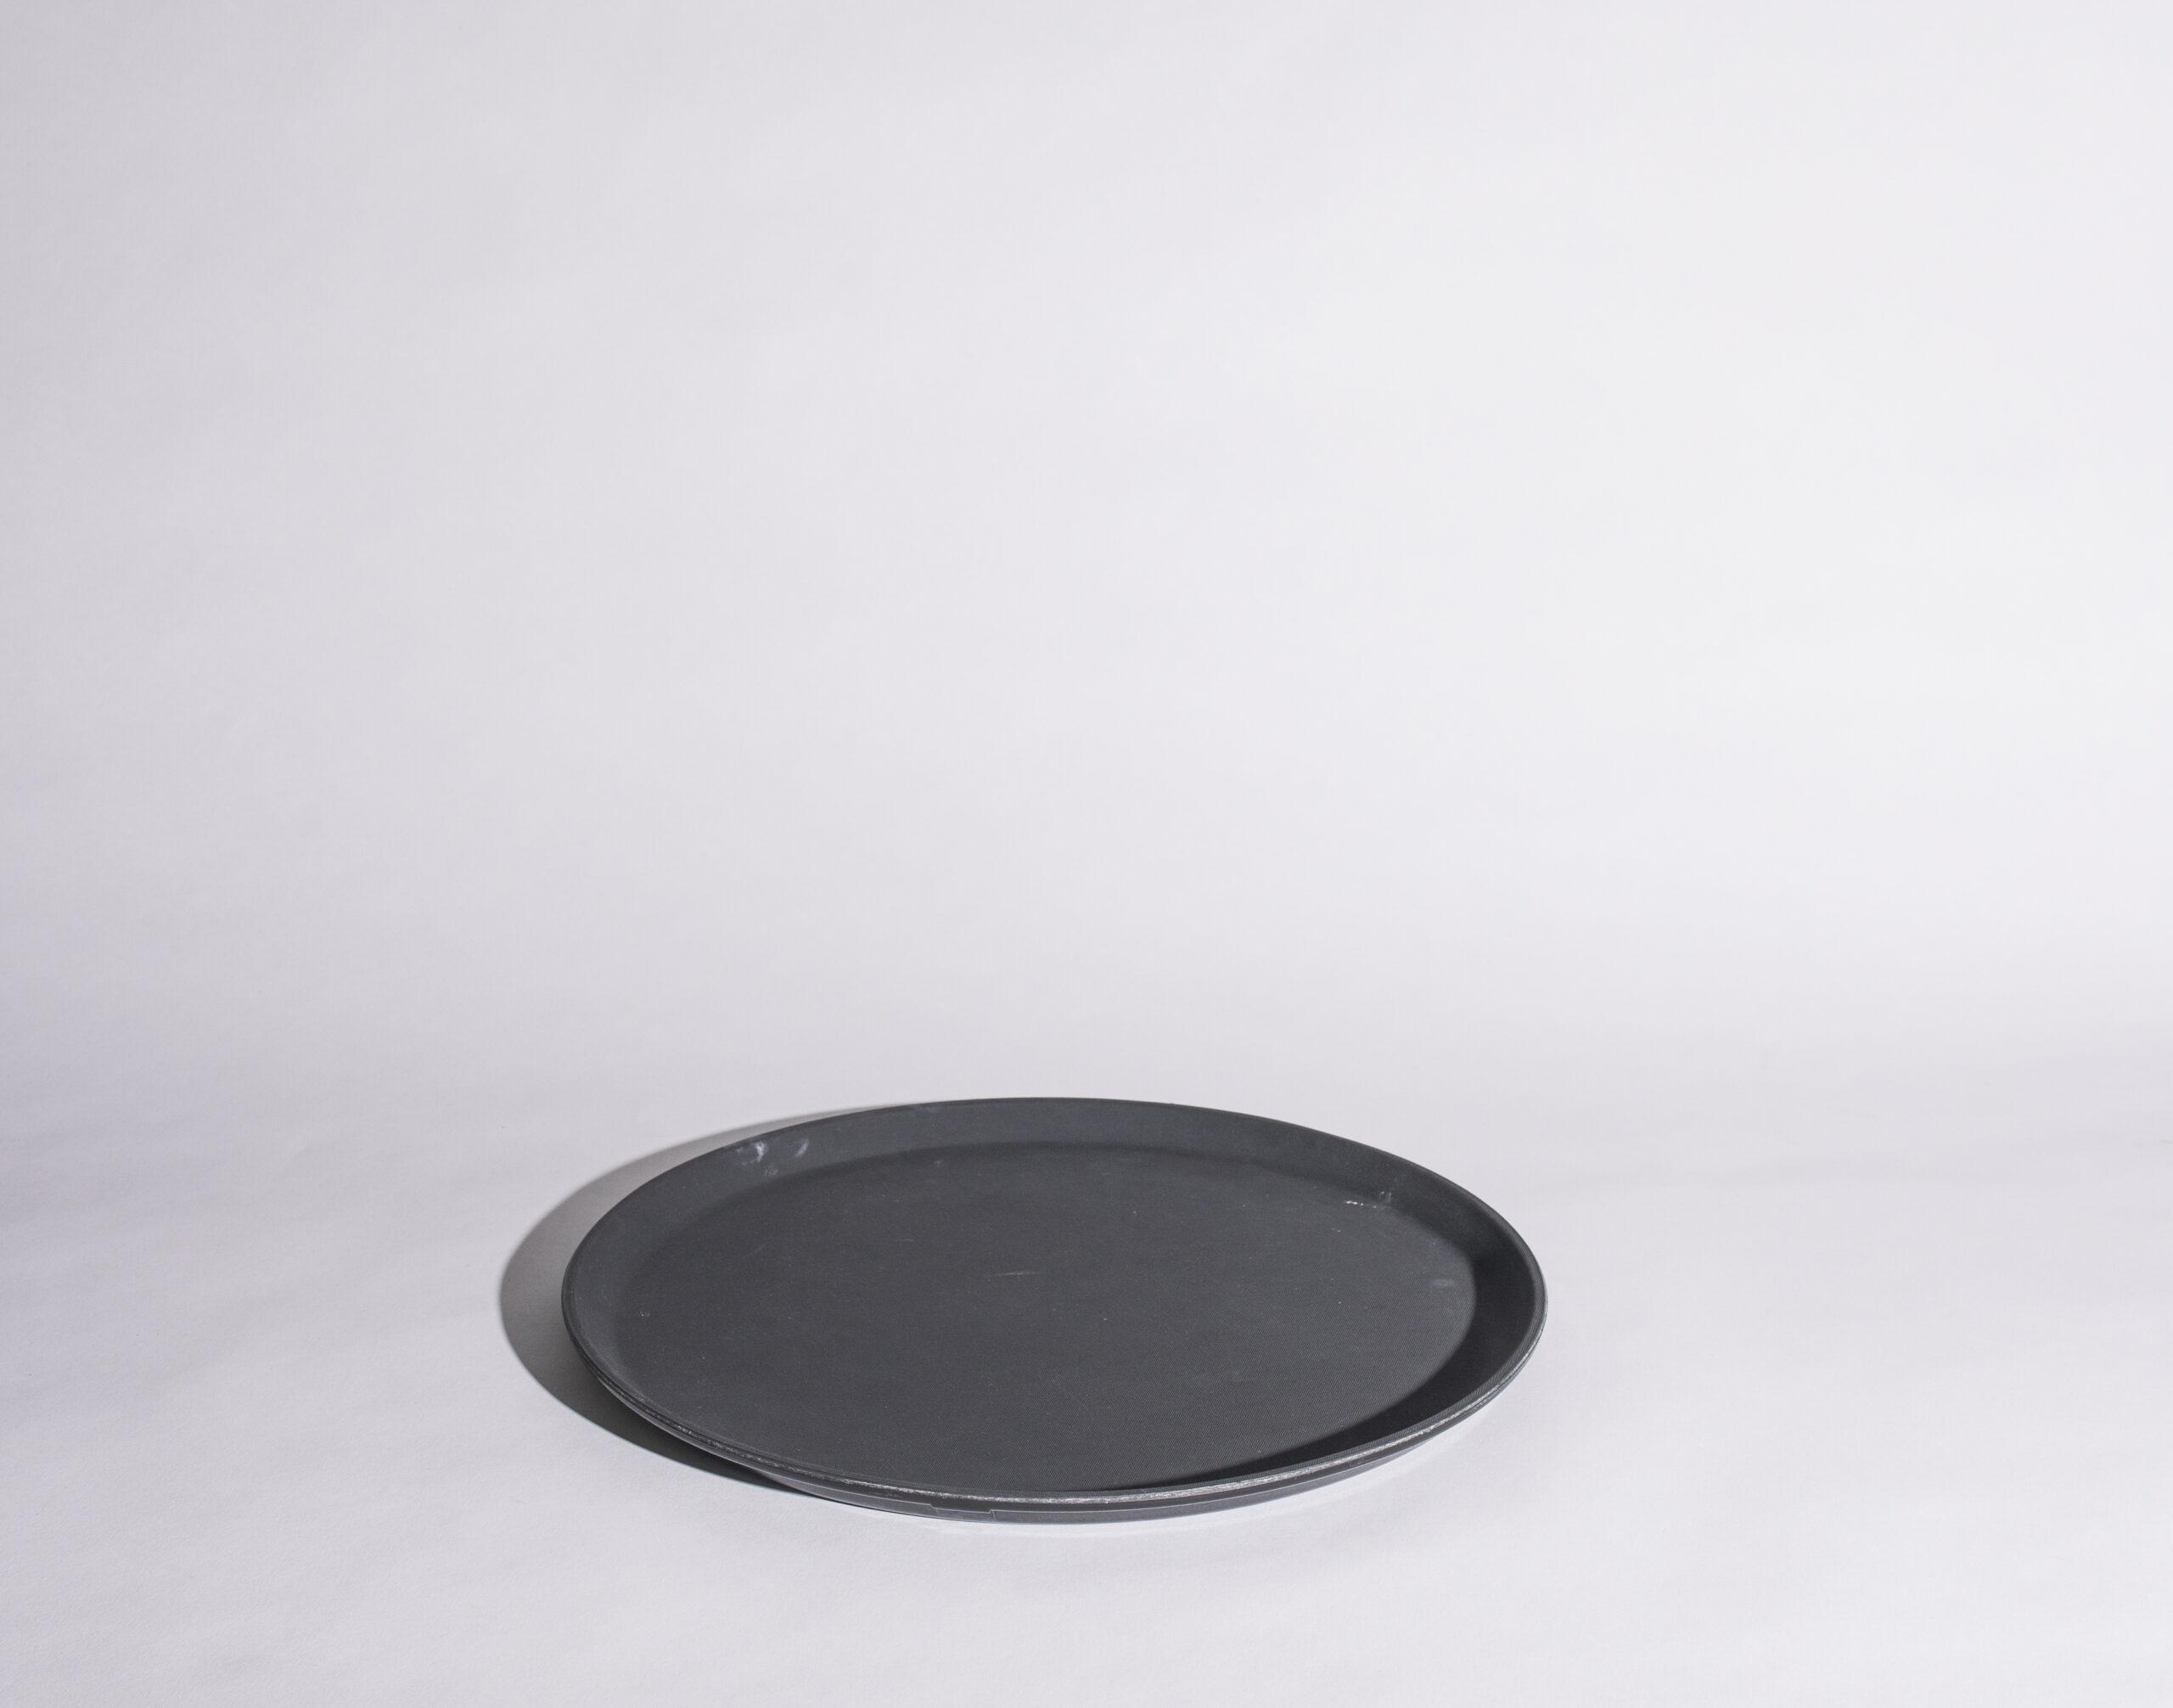 Bar tray (14'', round, plastic)